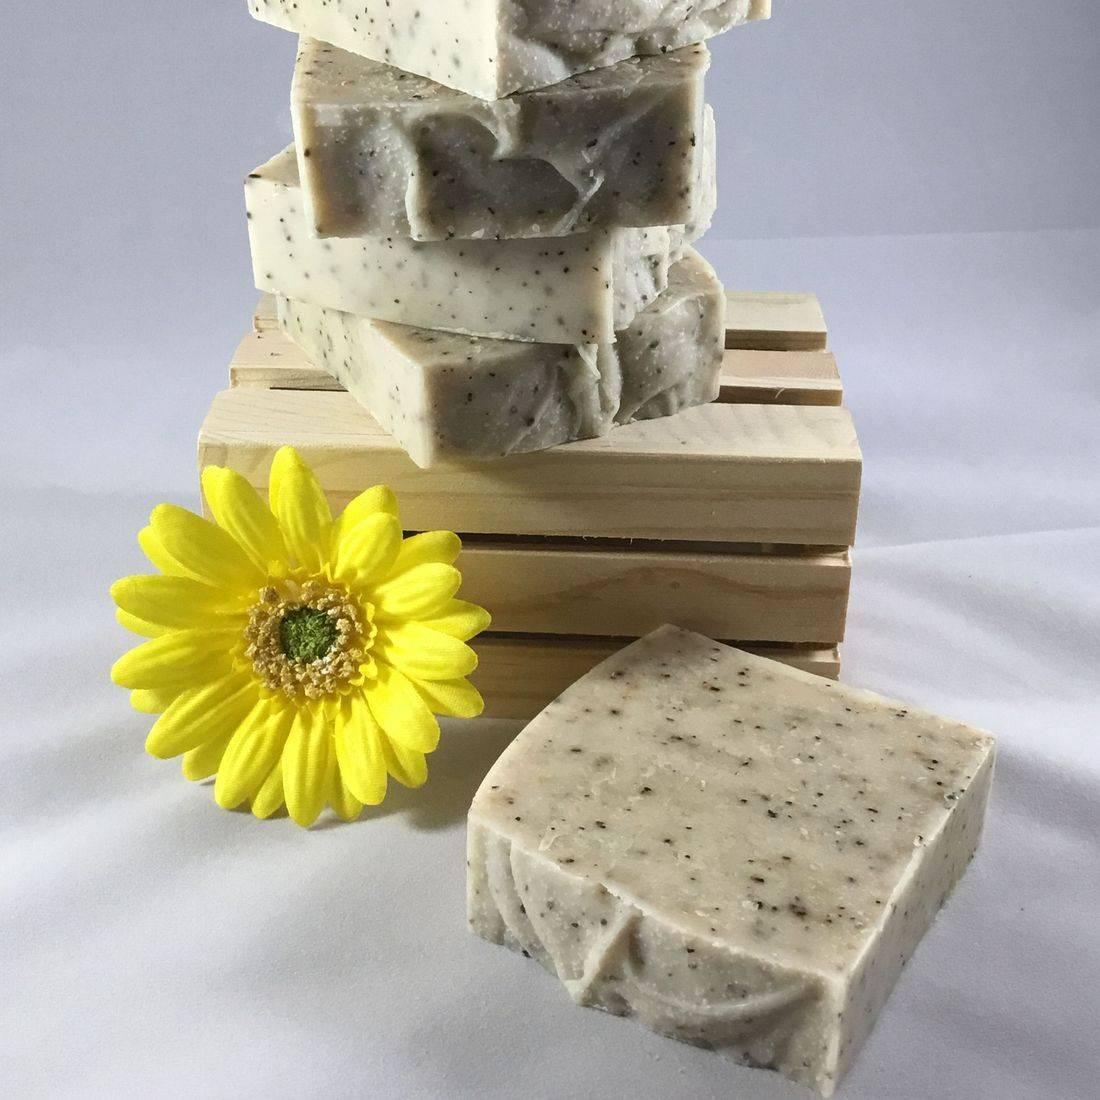 http://www.etsy.com/listing/464975392/lavender-lemonade-natural-linen-spray?ref=shop_home_active_1